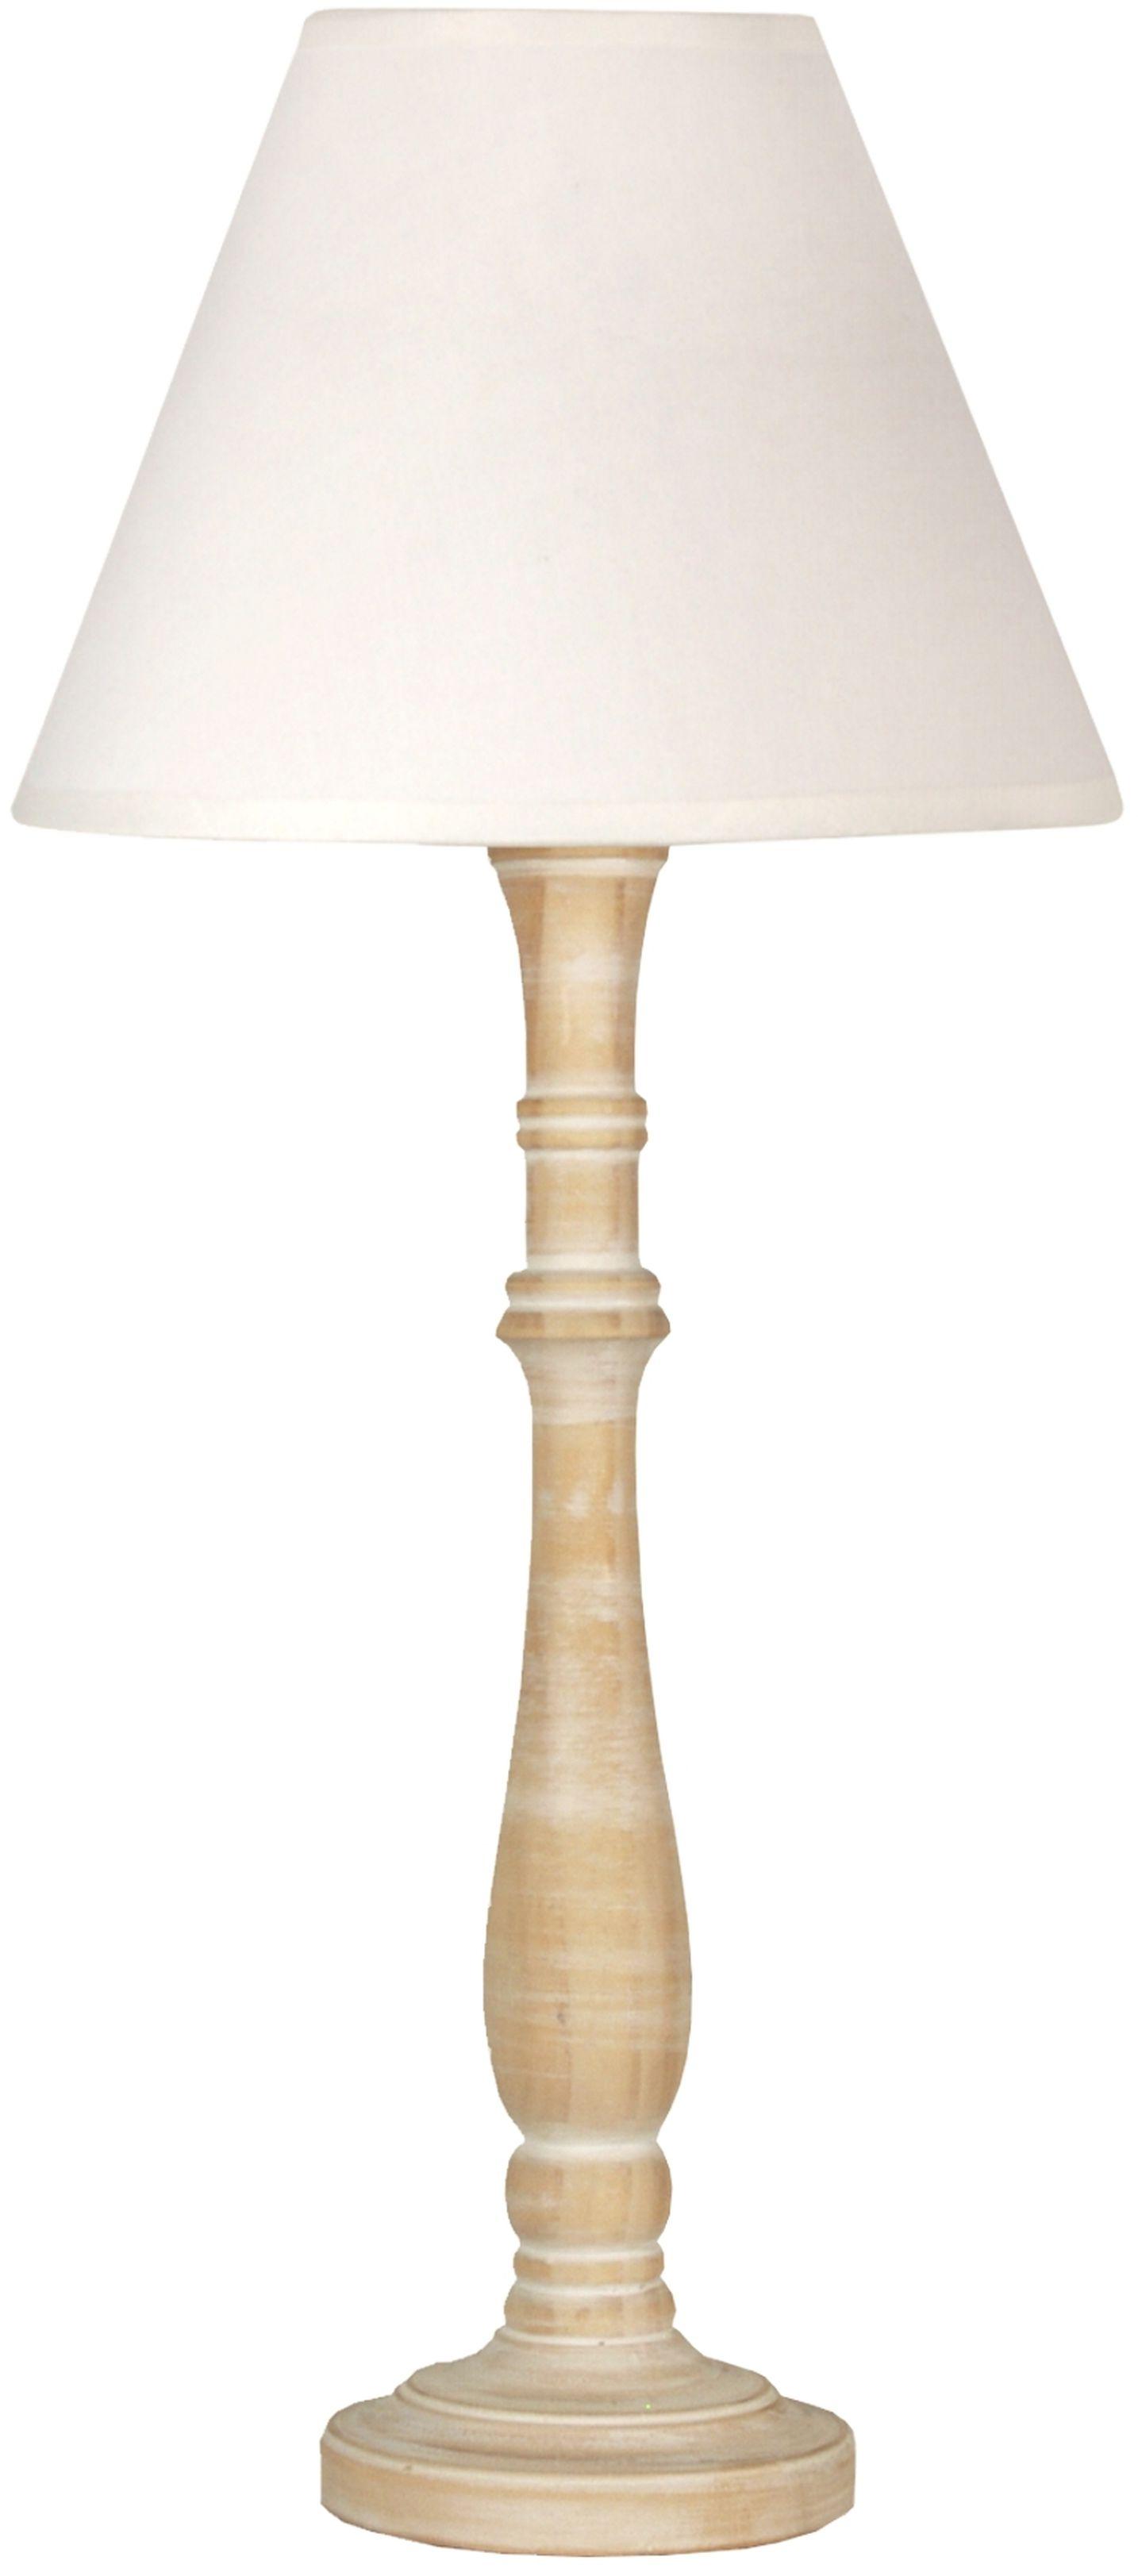 Candellux FOLCLORE 5 41-80748 lampa stołowa abażur biała 1X60W E27 20 cm